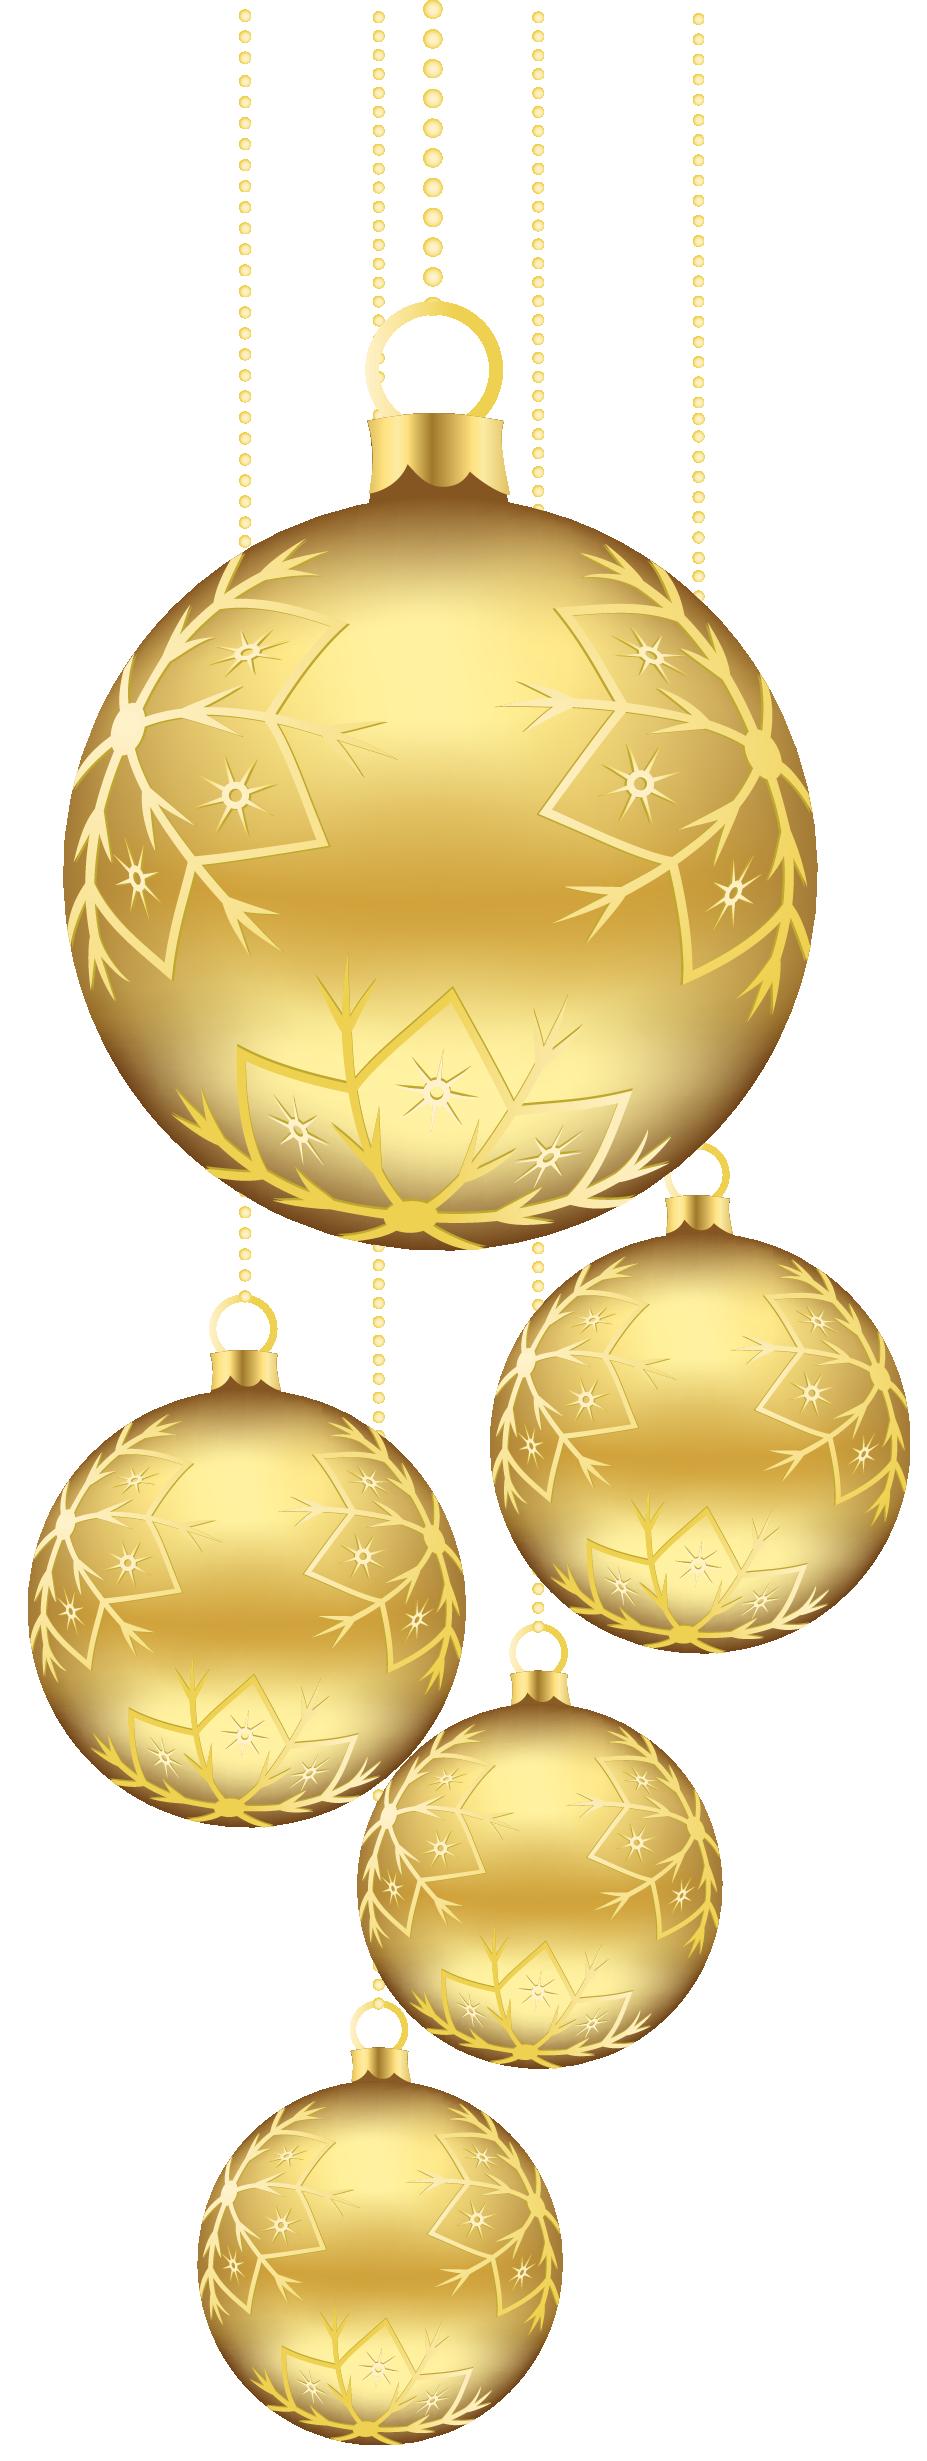 gold clipart xmas